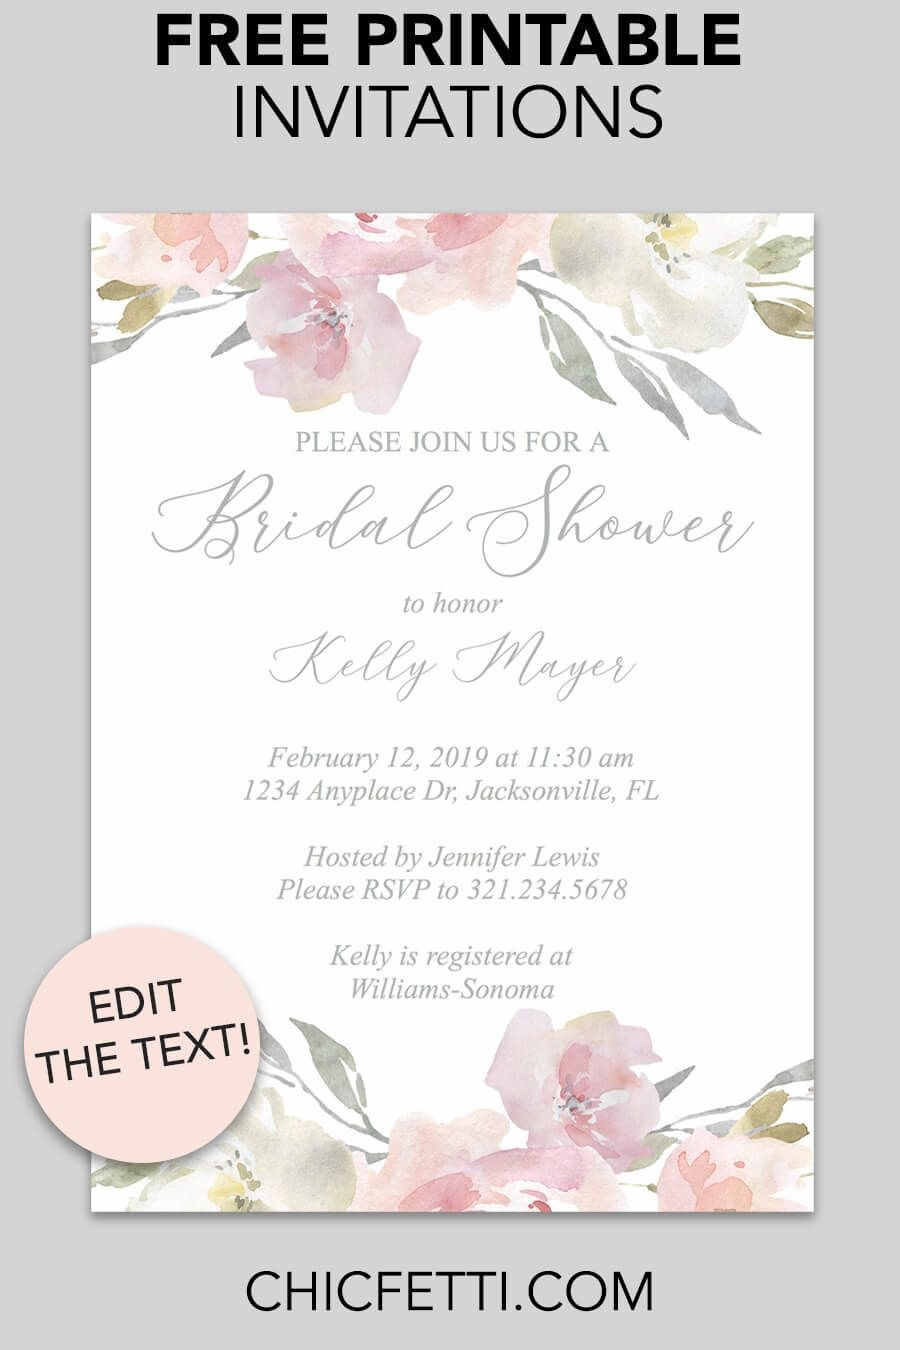 Bridal Shower Printable Invitation (Blush Floral | Invitations - Free Printable Bridal Shower Invitations Templates